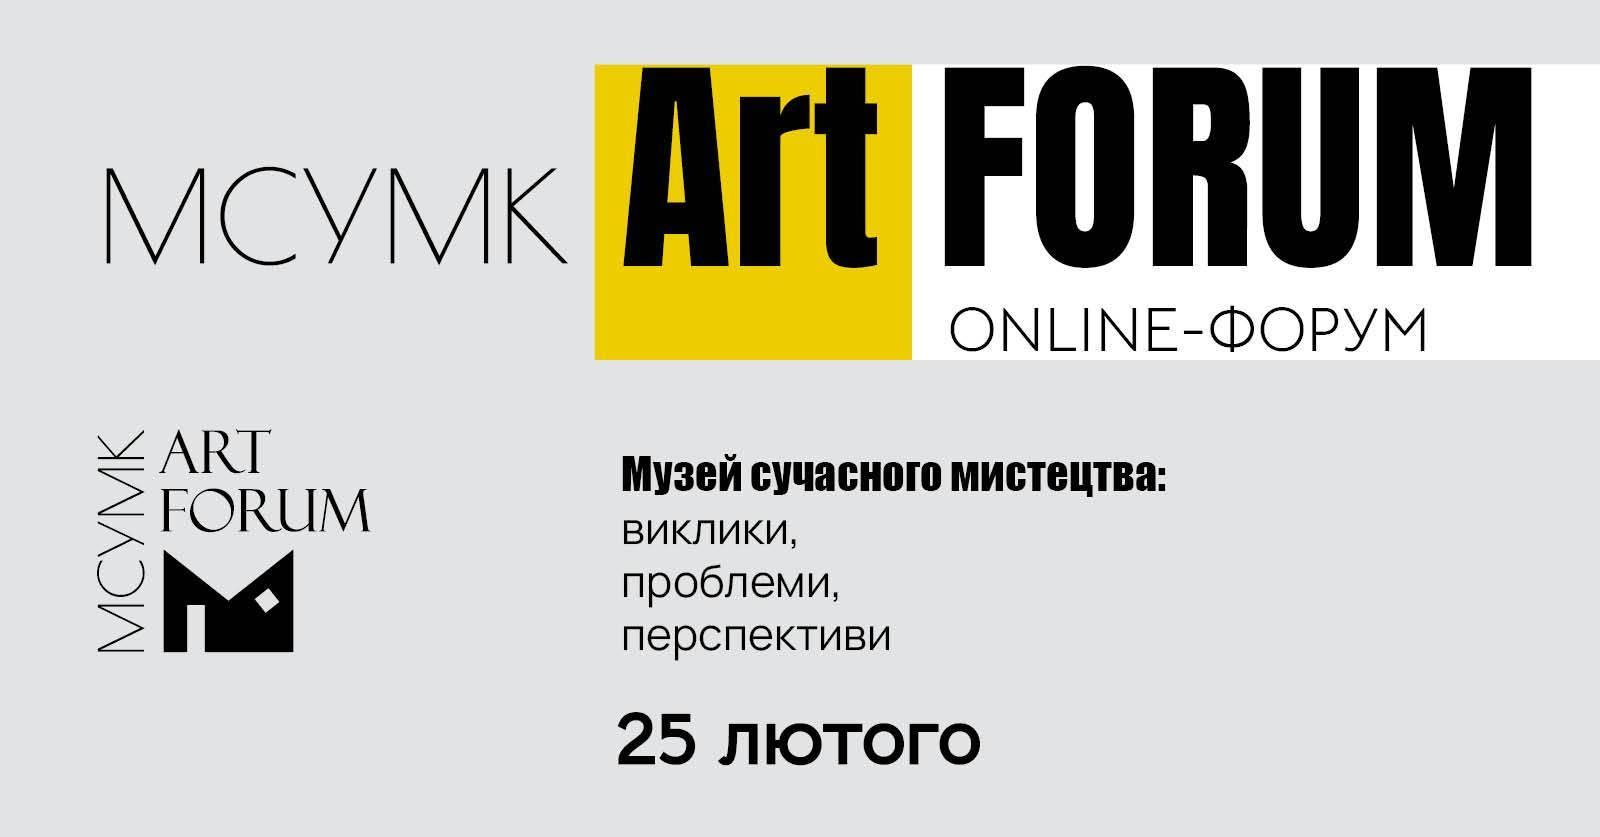 МСУМК Art Forum